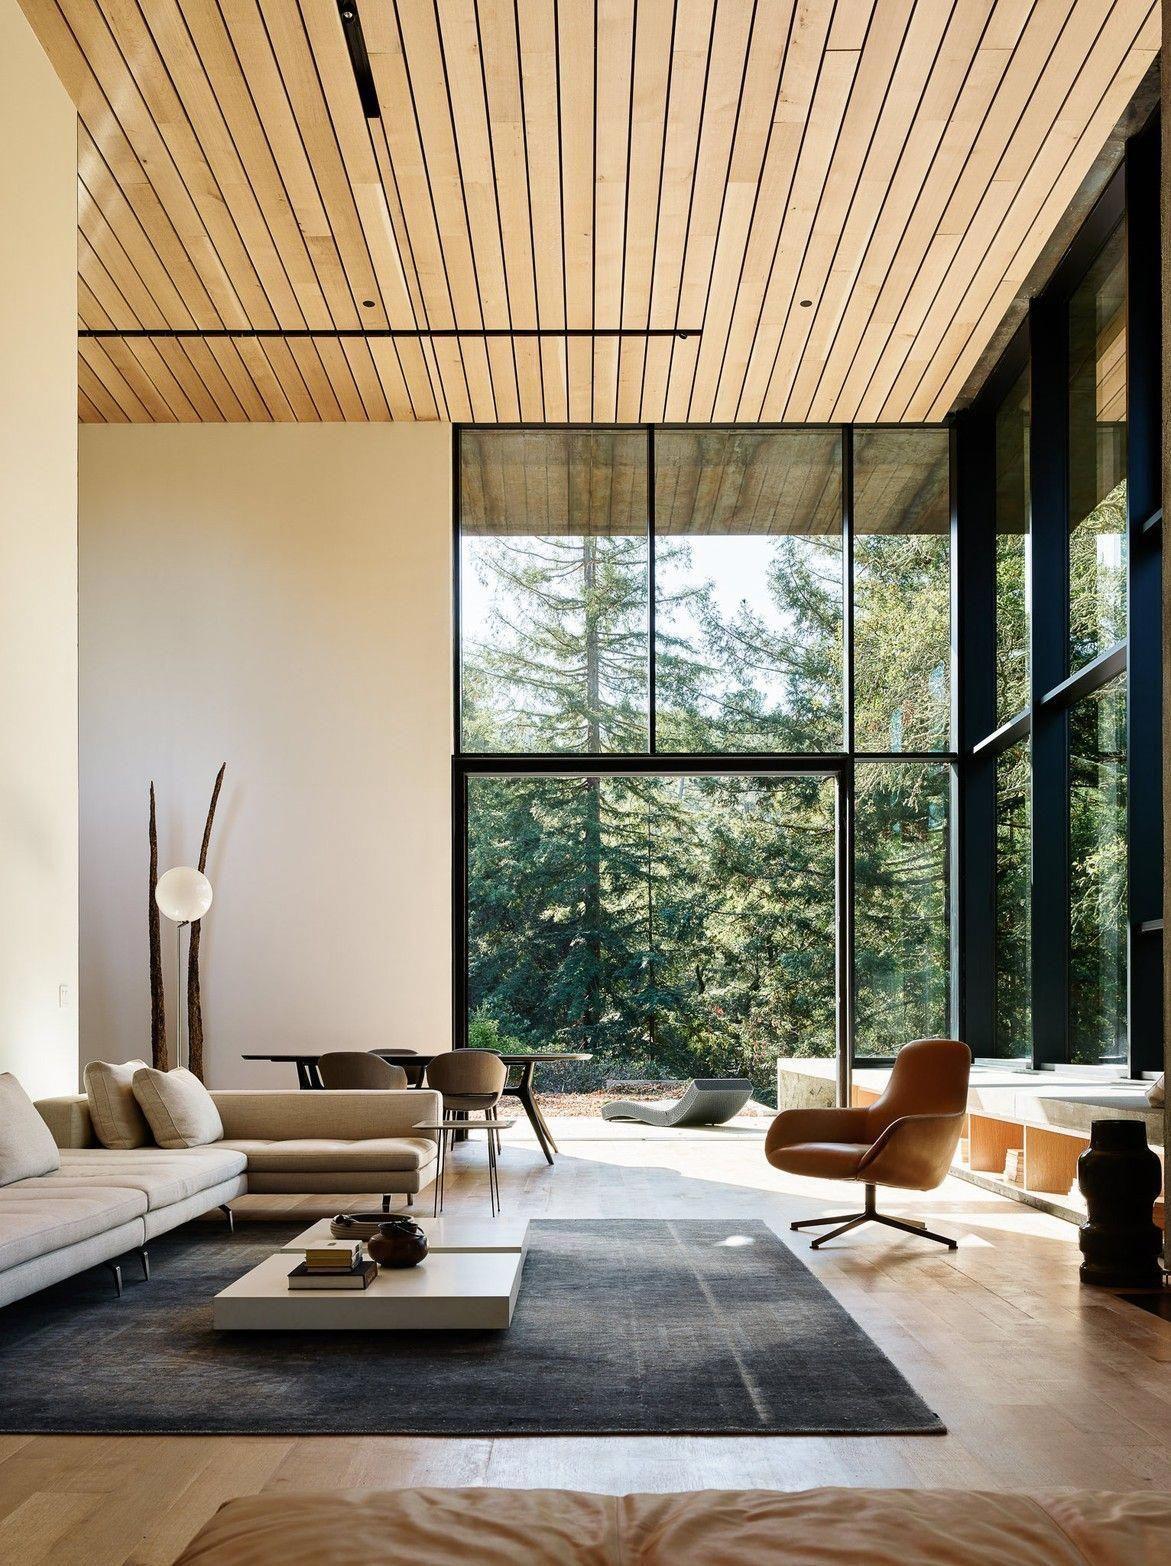 Modern Interior Design Characteristics Moderninteriordesign Home Interior Design Interior Architecture Design House Interior